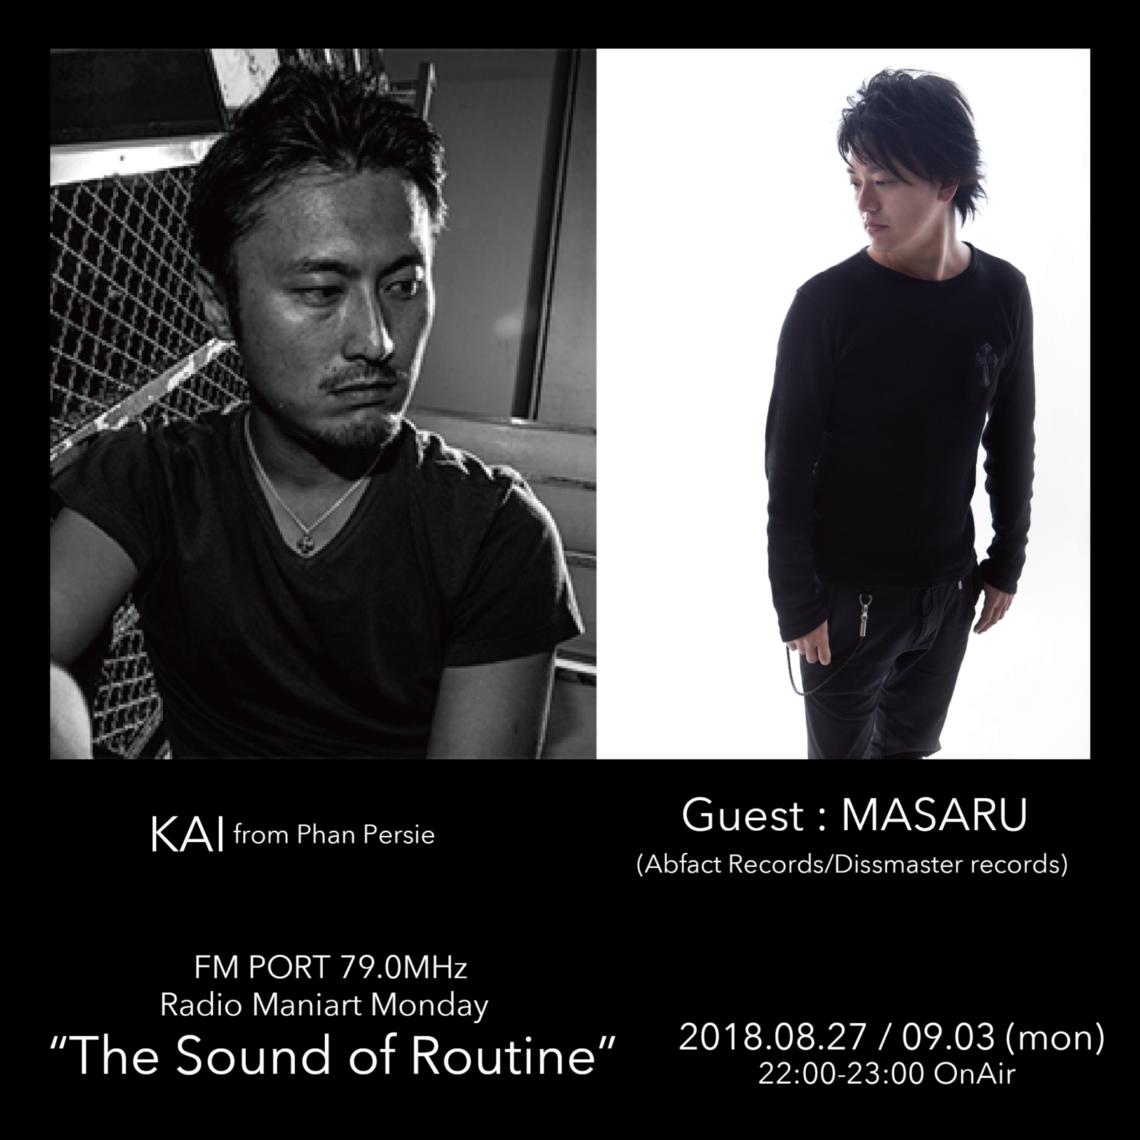 2018.8.27 MON, 9.3 MON – KAI : Navigator on FM PORT / the Sound of Routine – Guest: MASARU